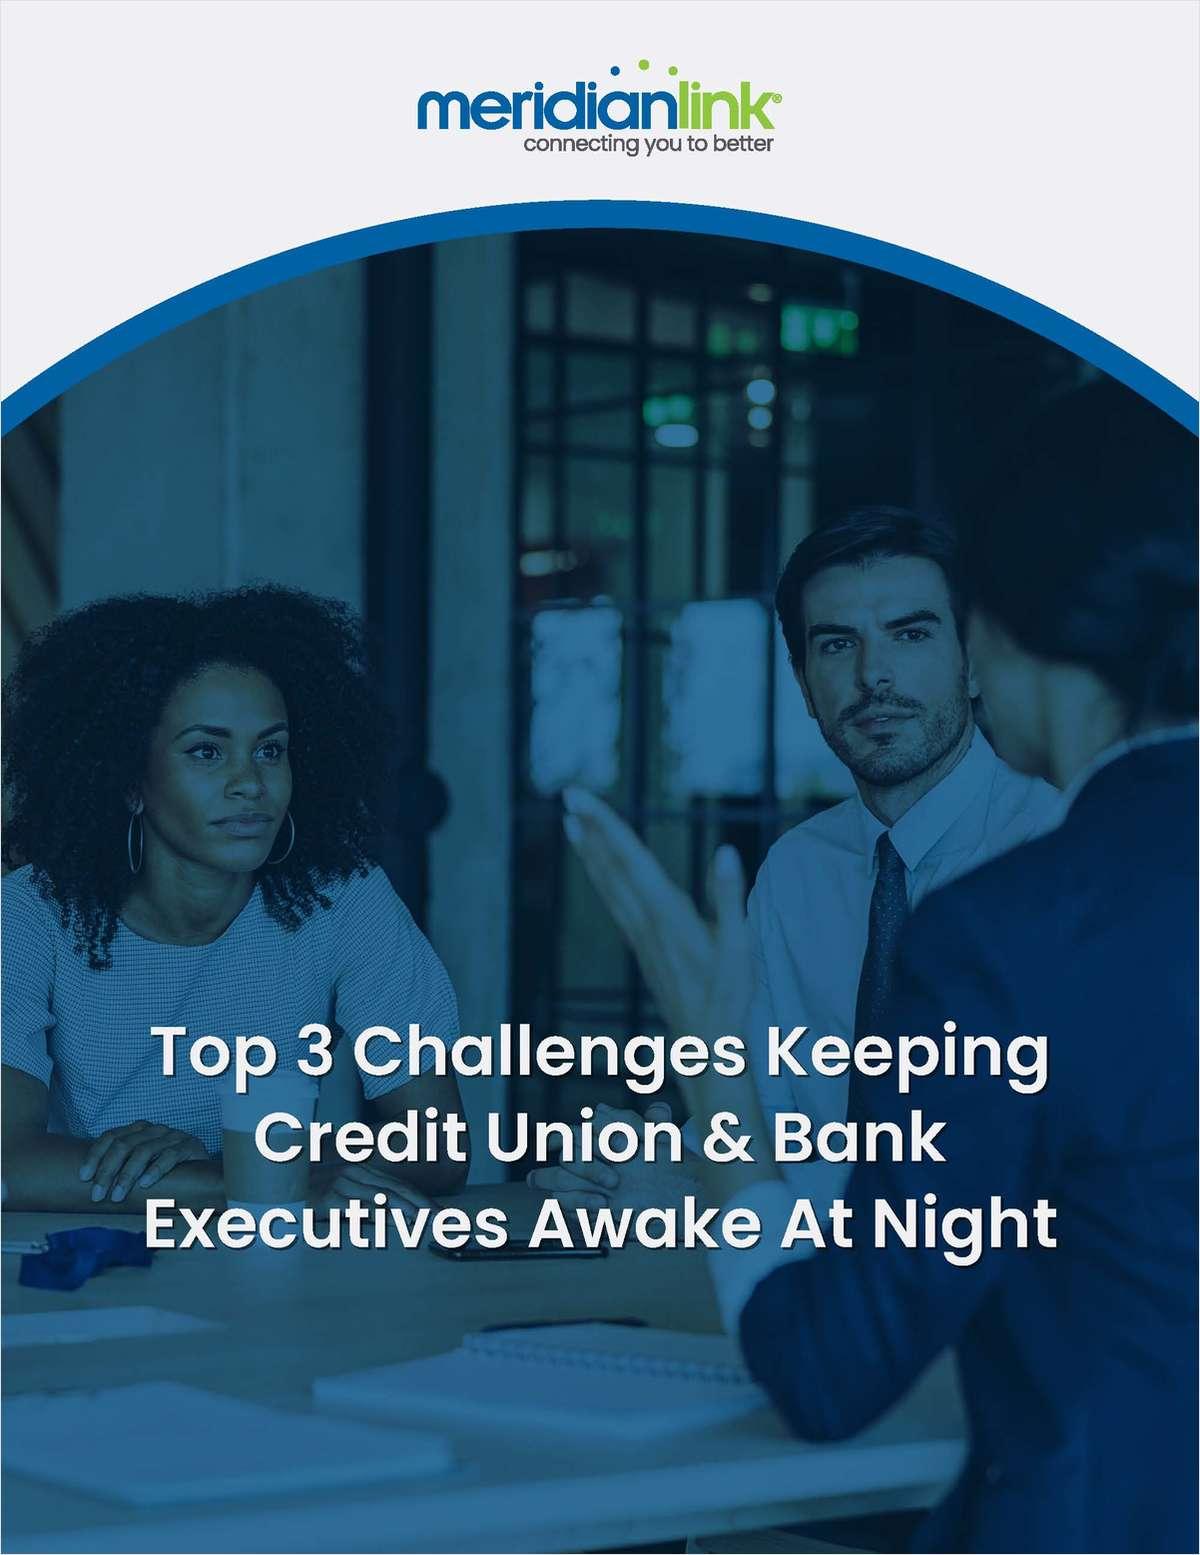 Top 3 Challenges Keeping Credit Union & Bank Executives Awake at Night